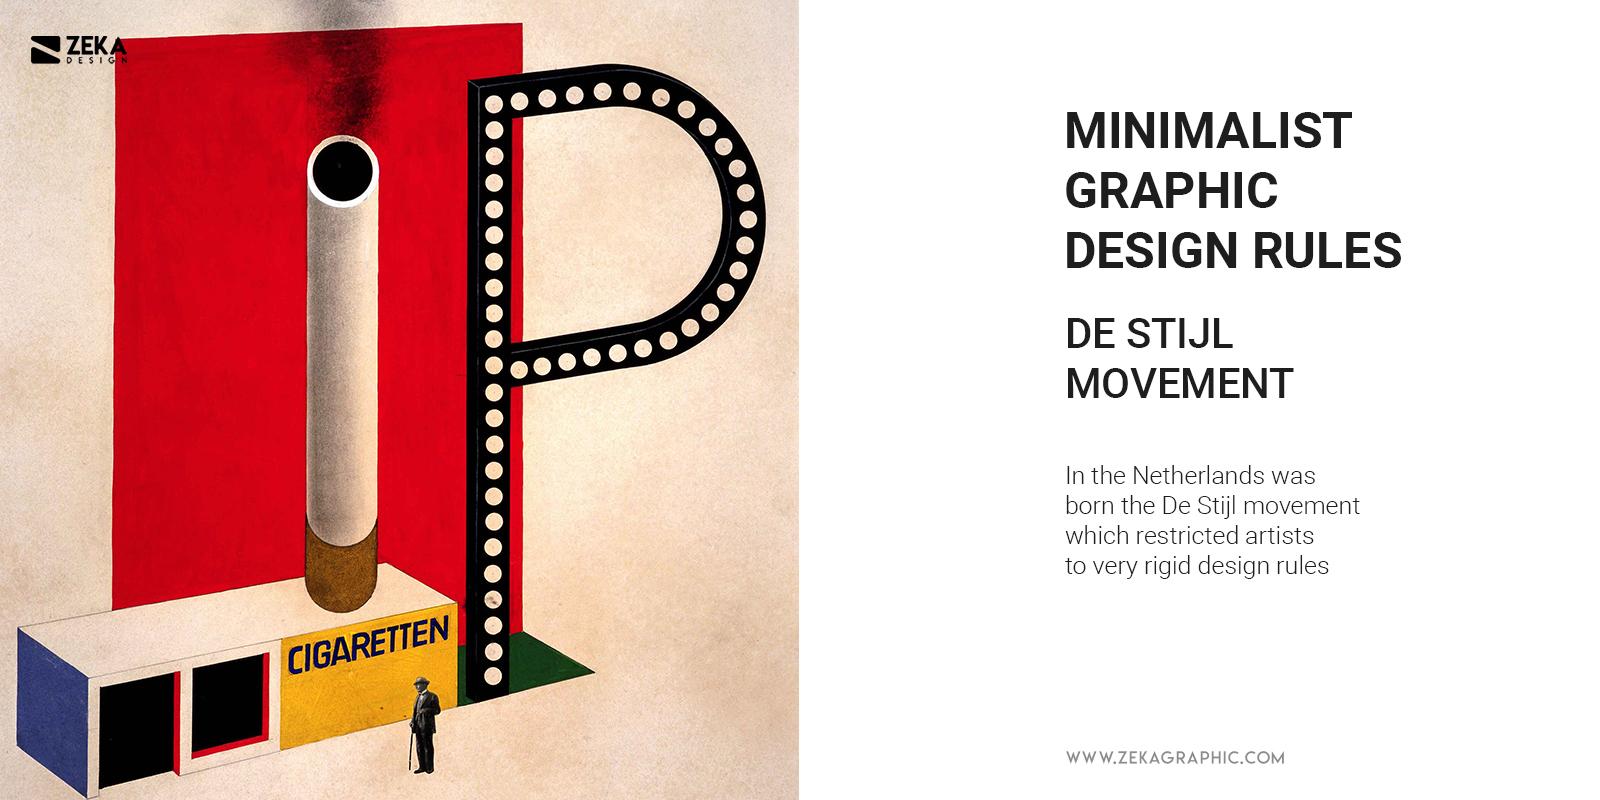 De Stijl Minimalist Graphic Design Rules